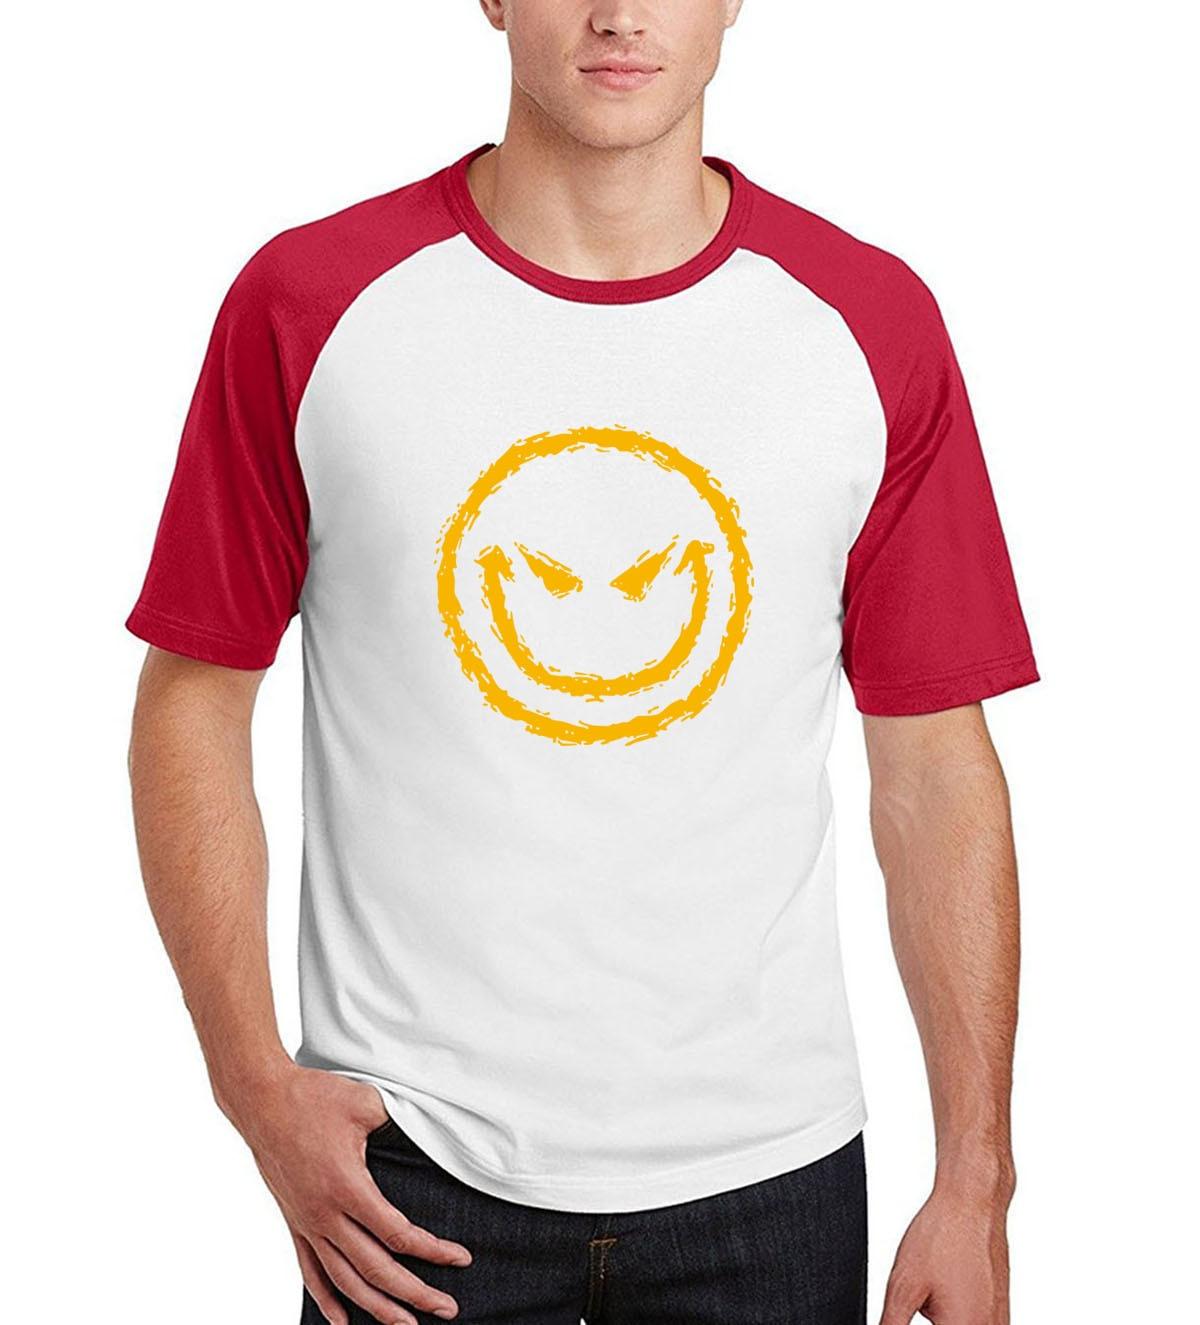 harajuku kpop brand camisetas homme kpop Smiley Face t shirt 2019 men cotton fitness short sleeve tops summer casual raglan tees